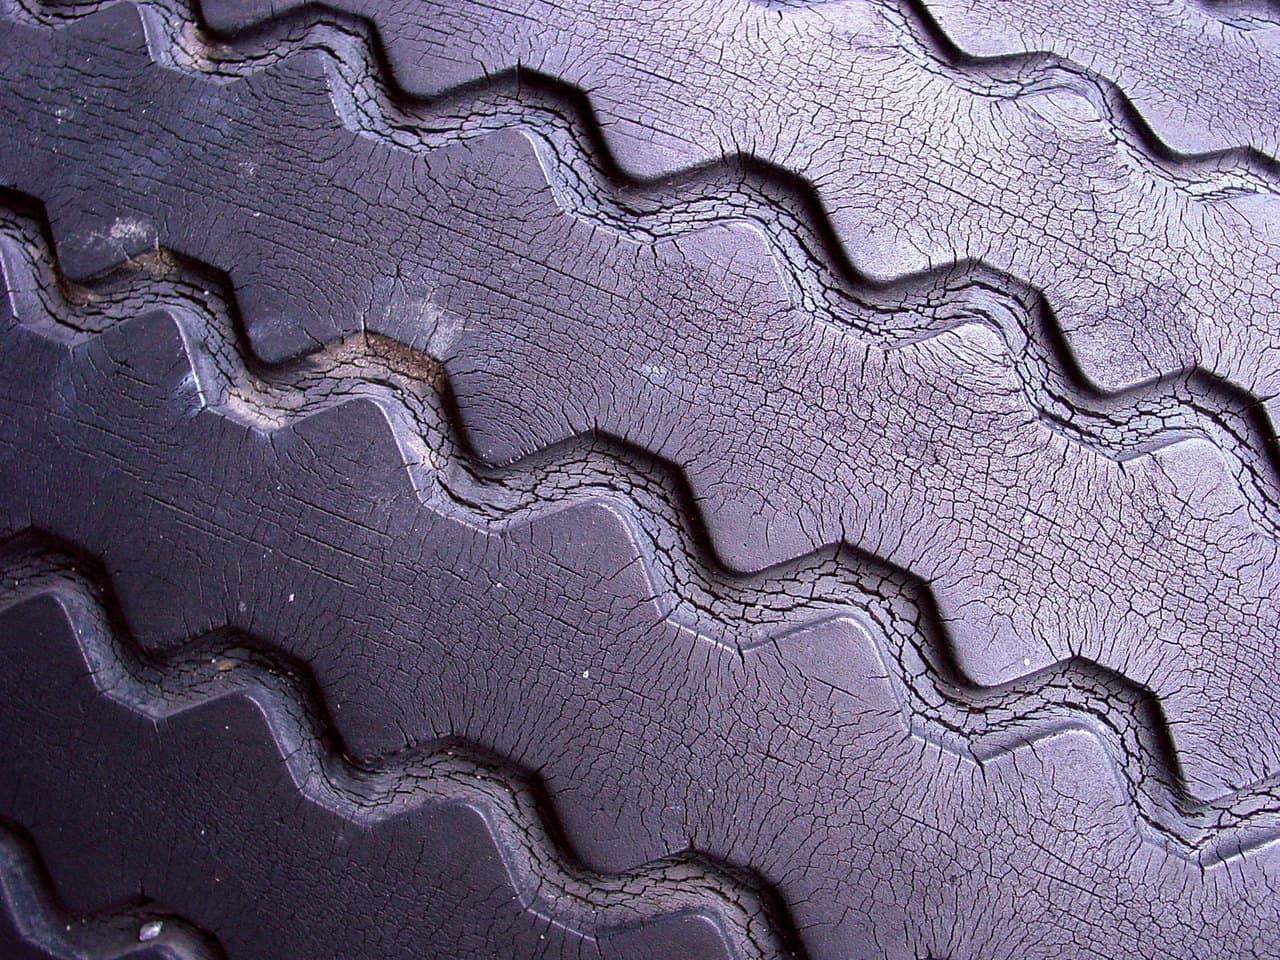 old tires industriagomma